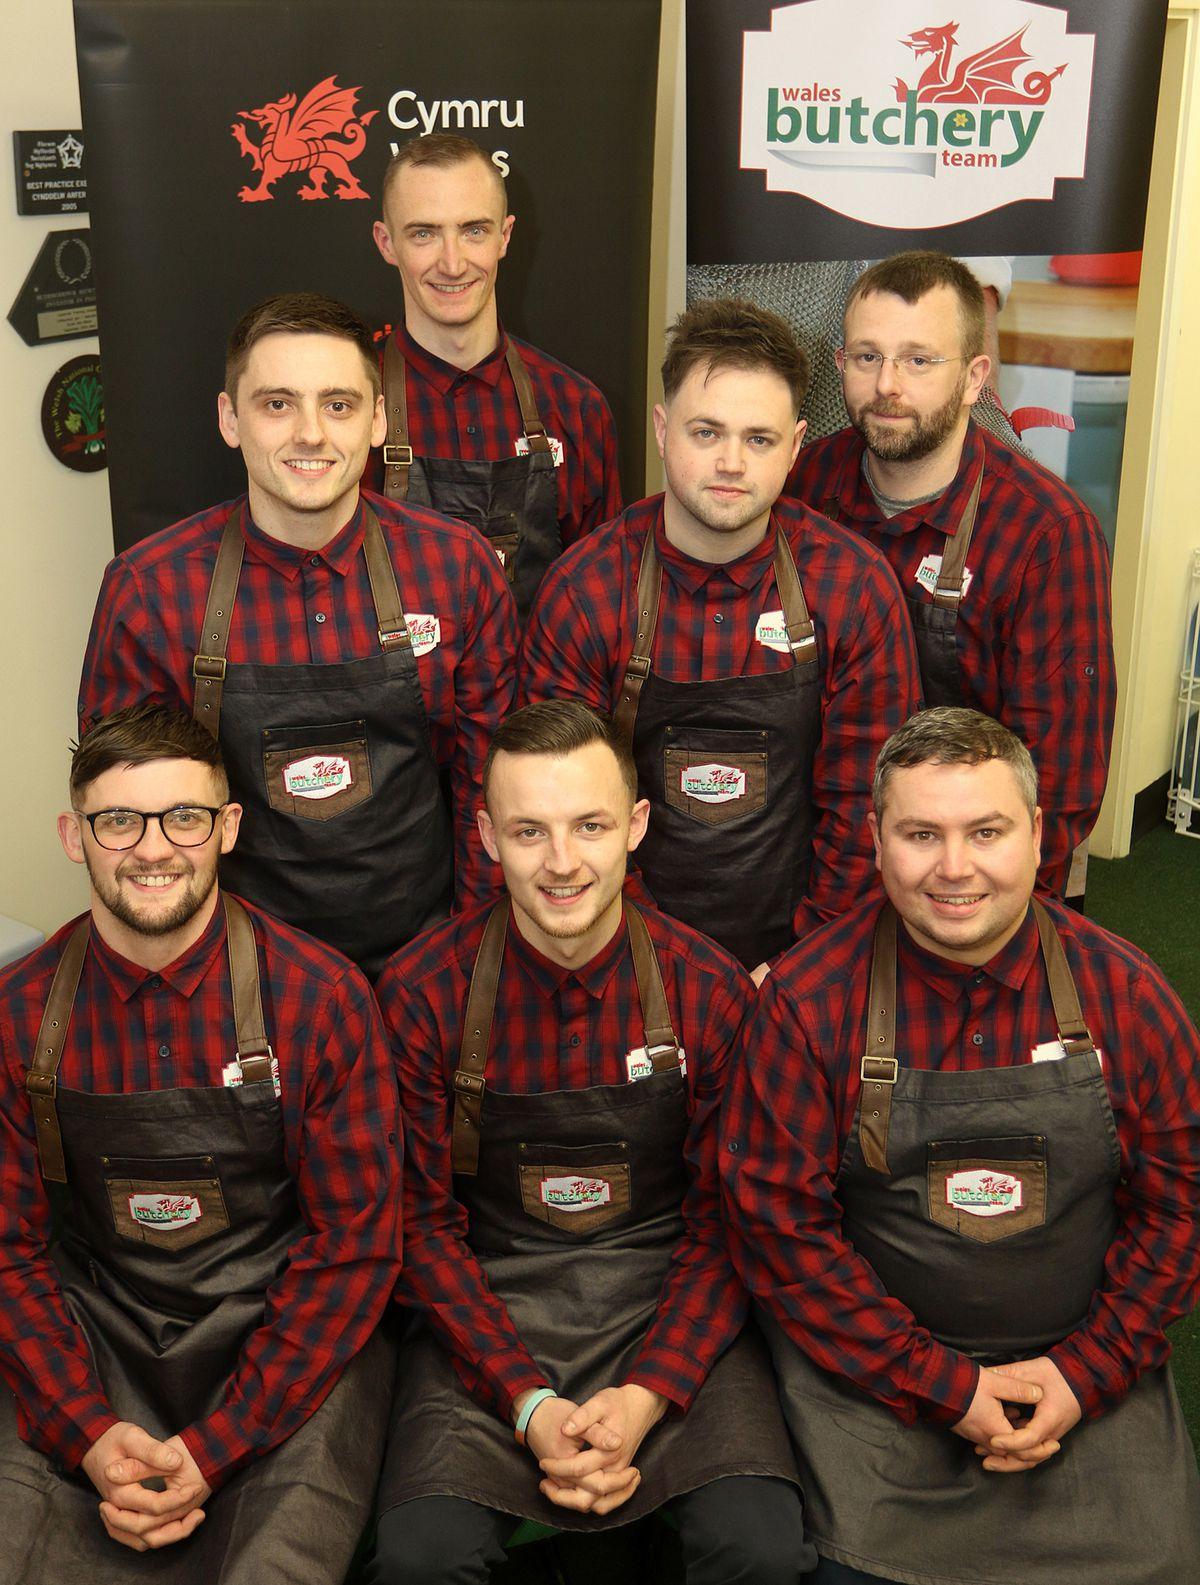 Wales Butchery Team